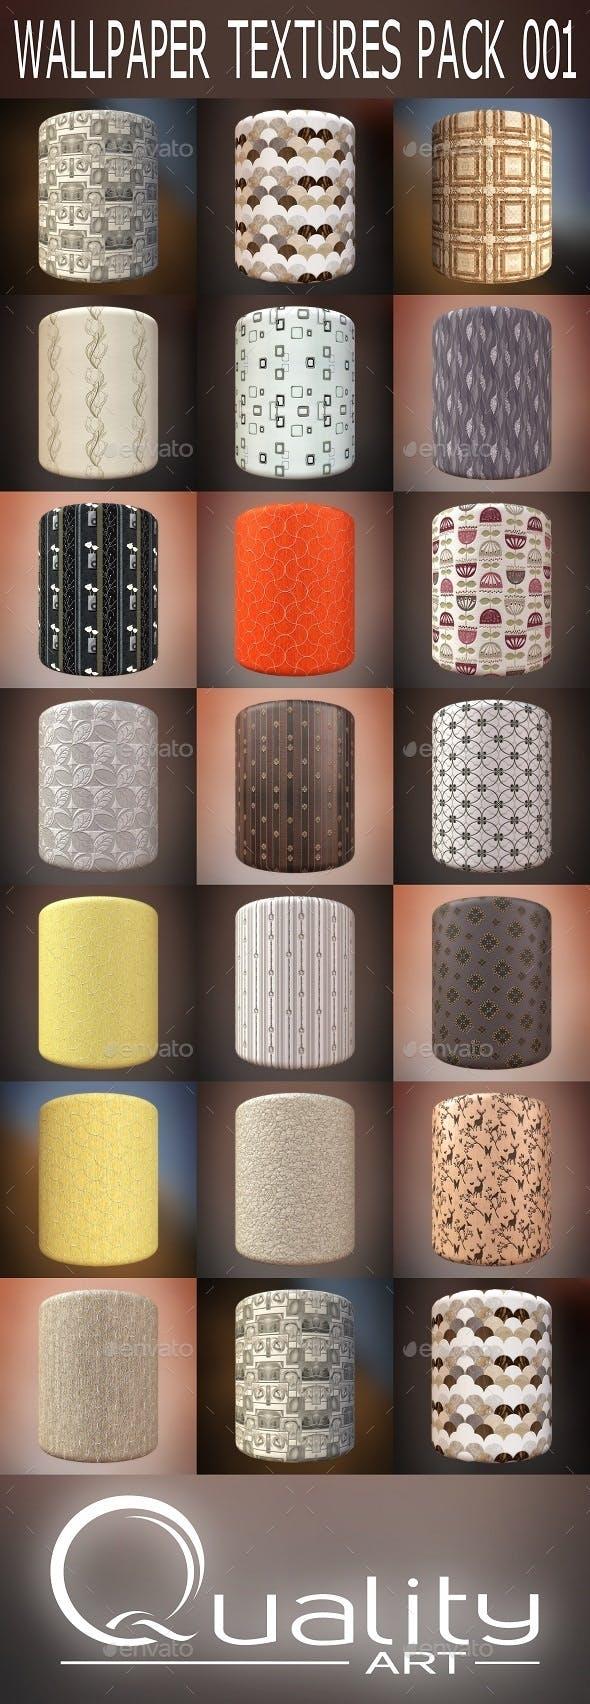 Wallpaper Textures Pack 001 - 3DOcean Item for Sale